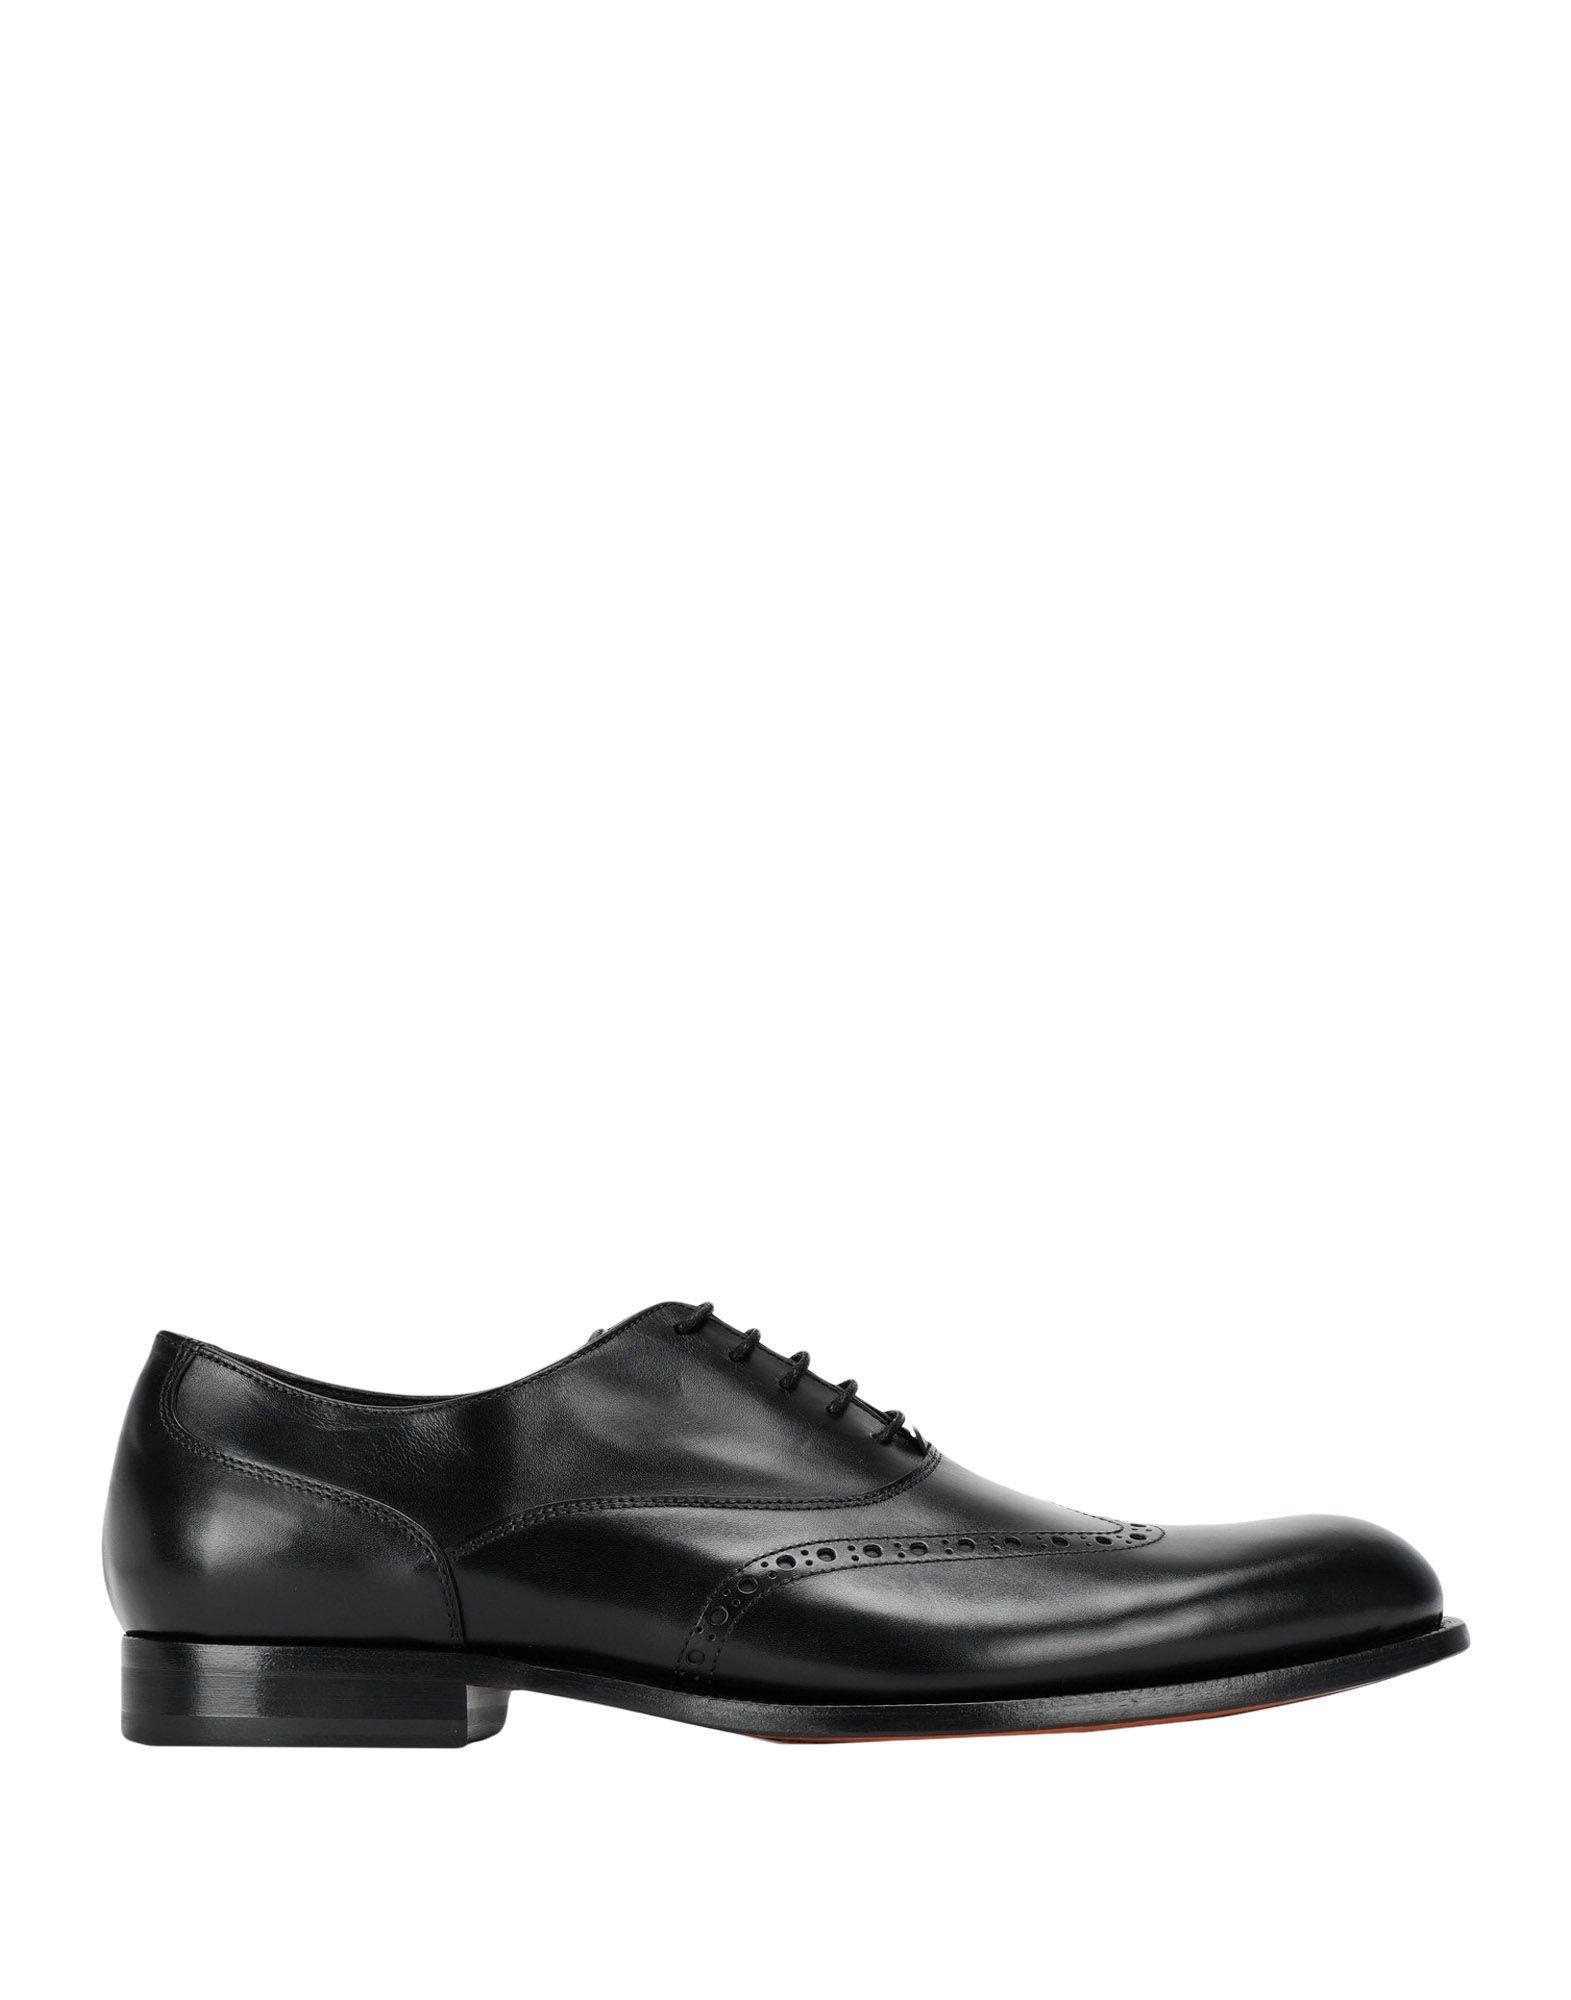 Chaussures  à lacets homme | Baskets pour homme | YOOX